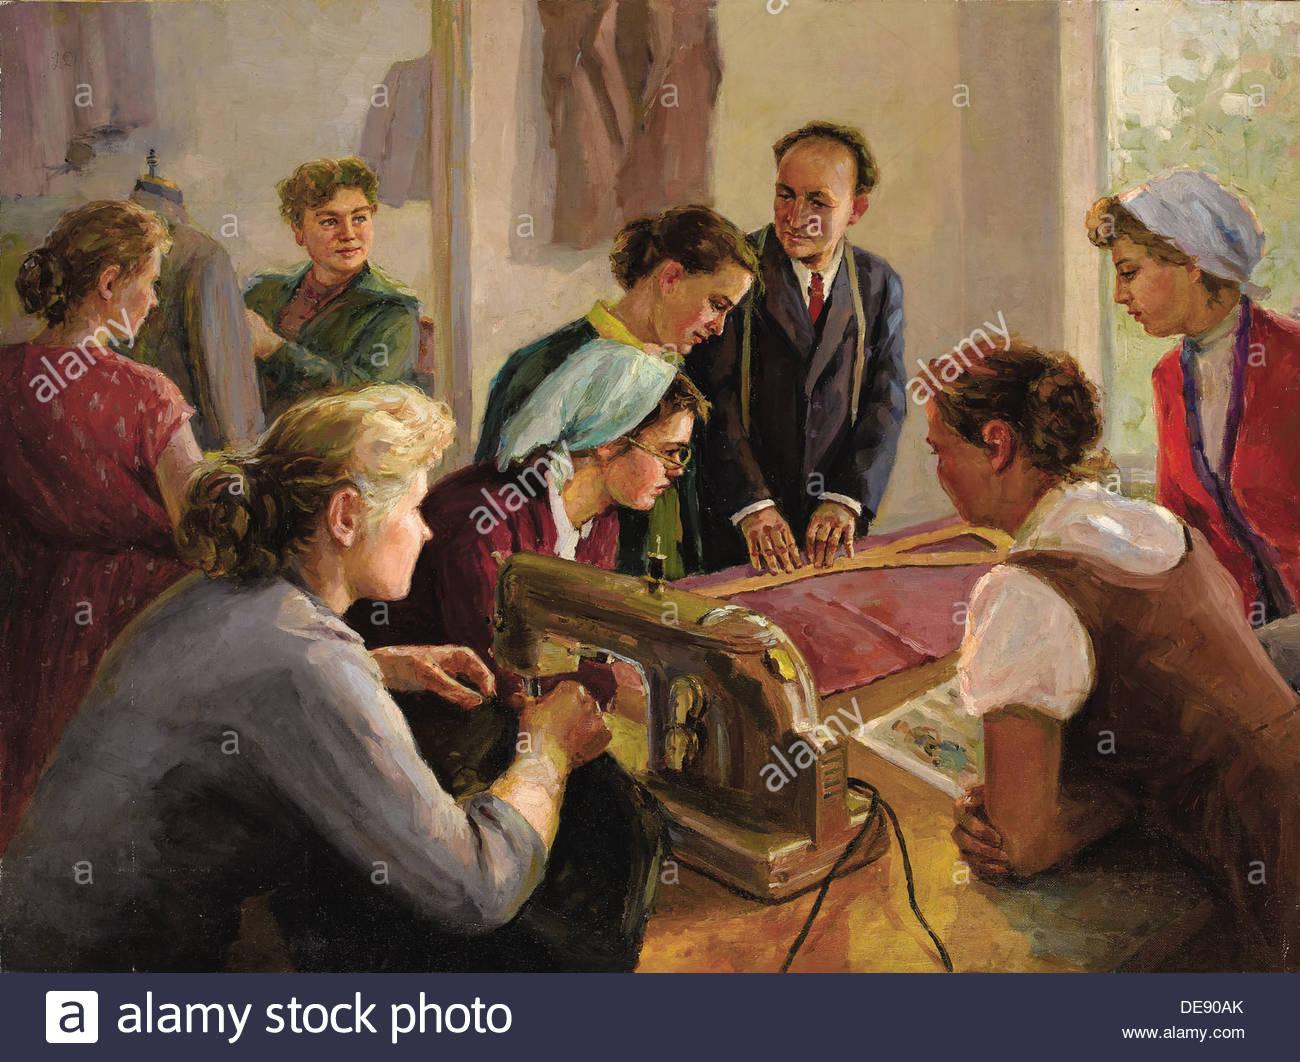 Die Näh-Lektion, 1960. Künstler: Bogdanov, Valentin Alexandrowitsch (1919-1985) Stockbild